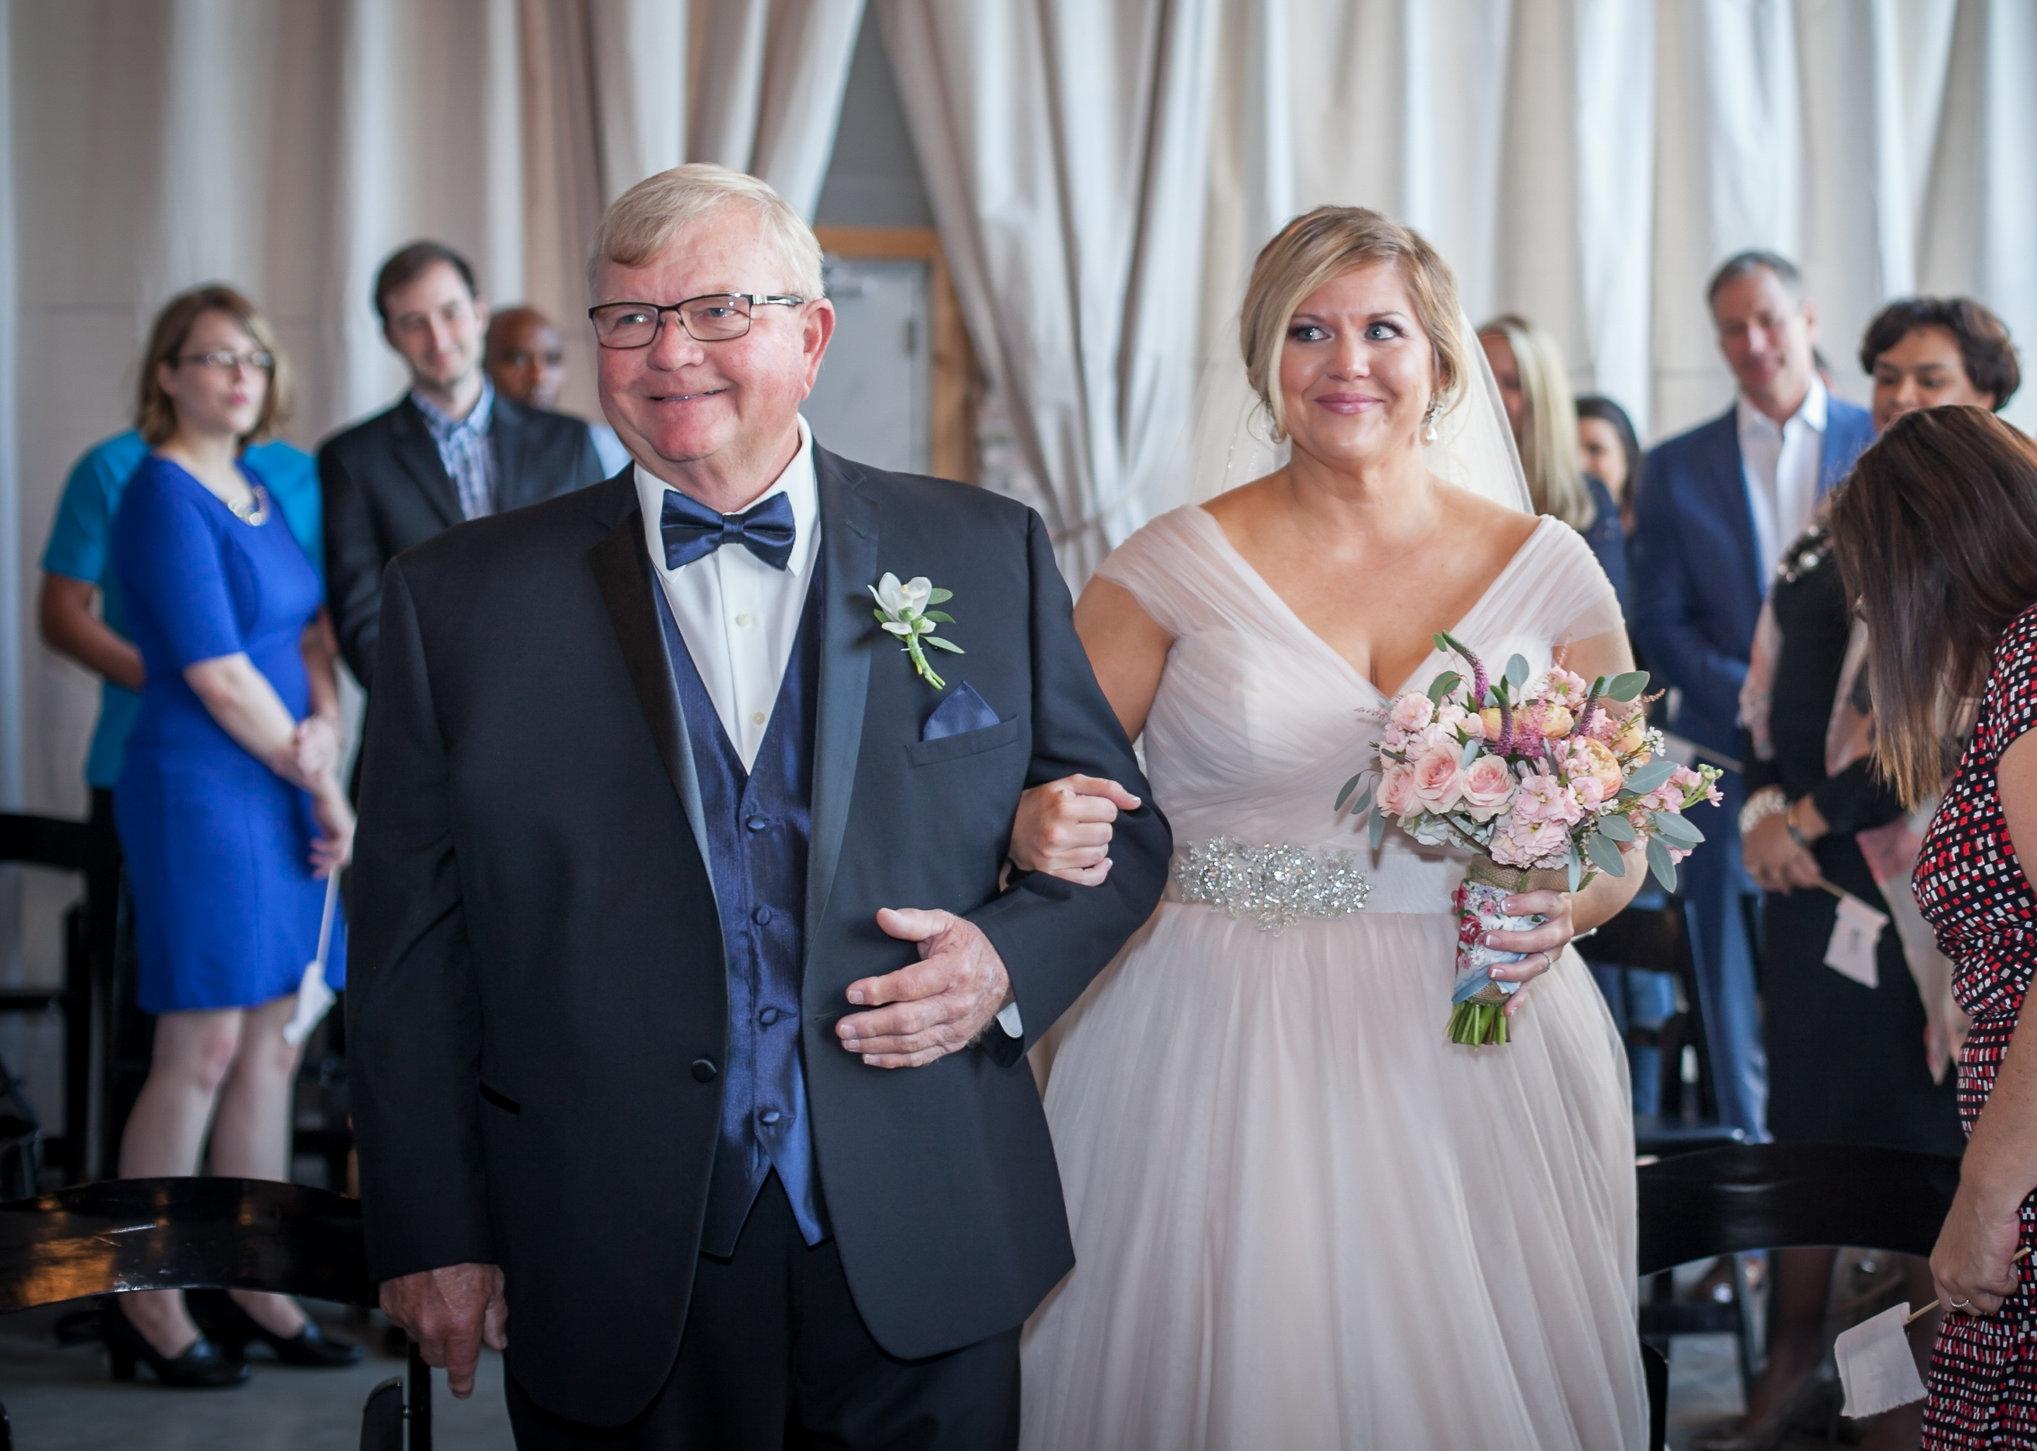 Kansas_City_Small_Wedding_Venue_Elope_Intimate_Ceremony_Budget_Affordable_Amy&Arron-68.jpg